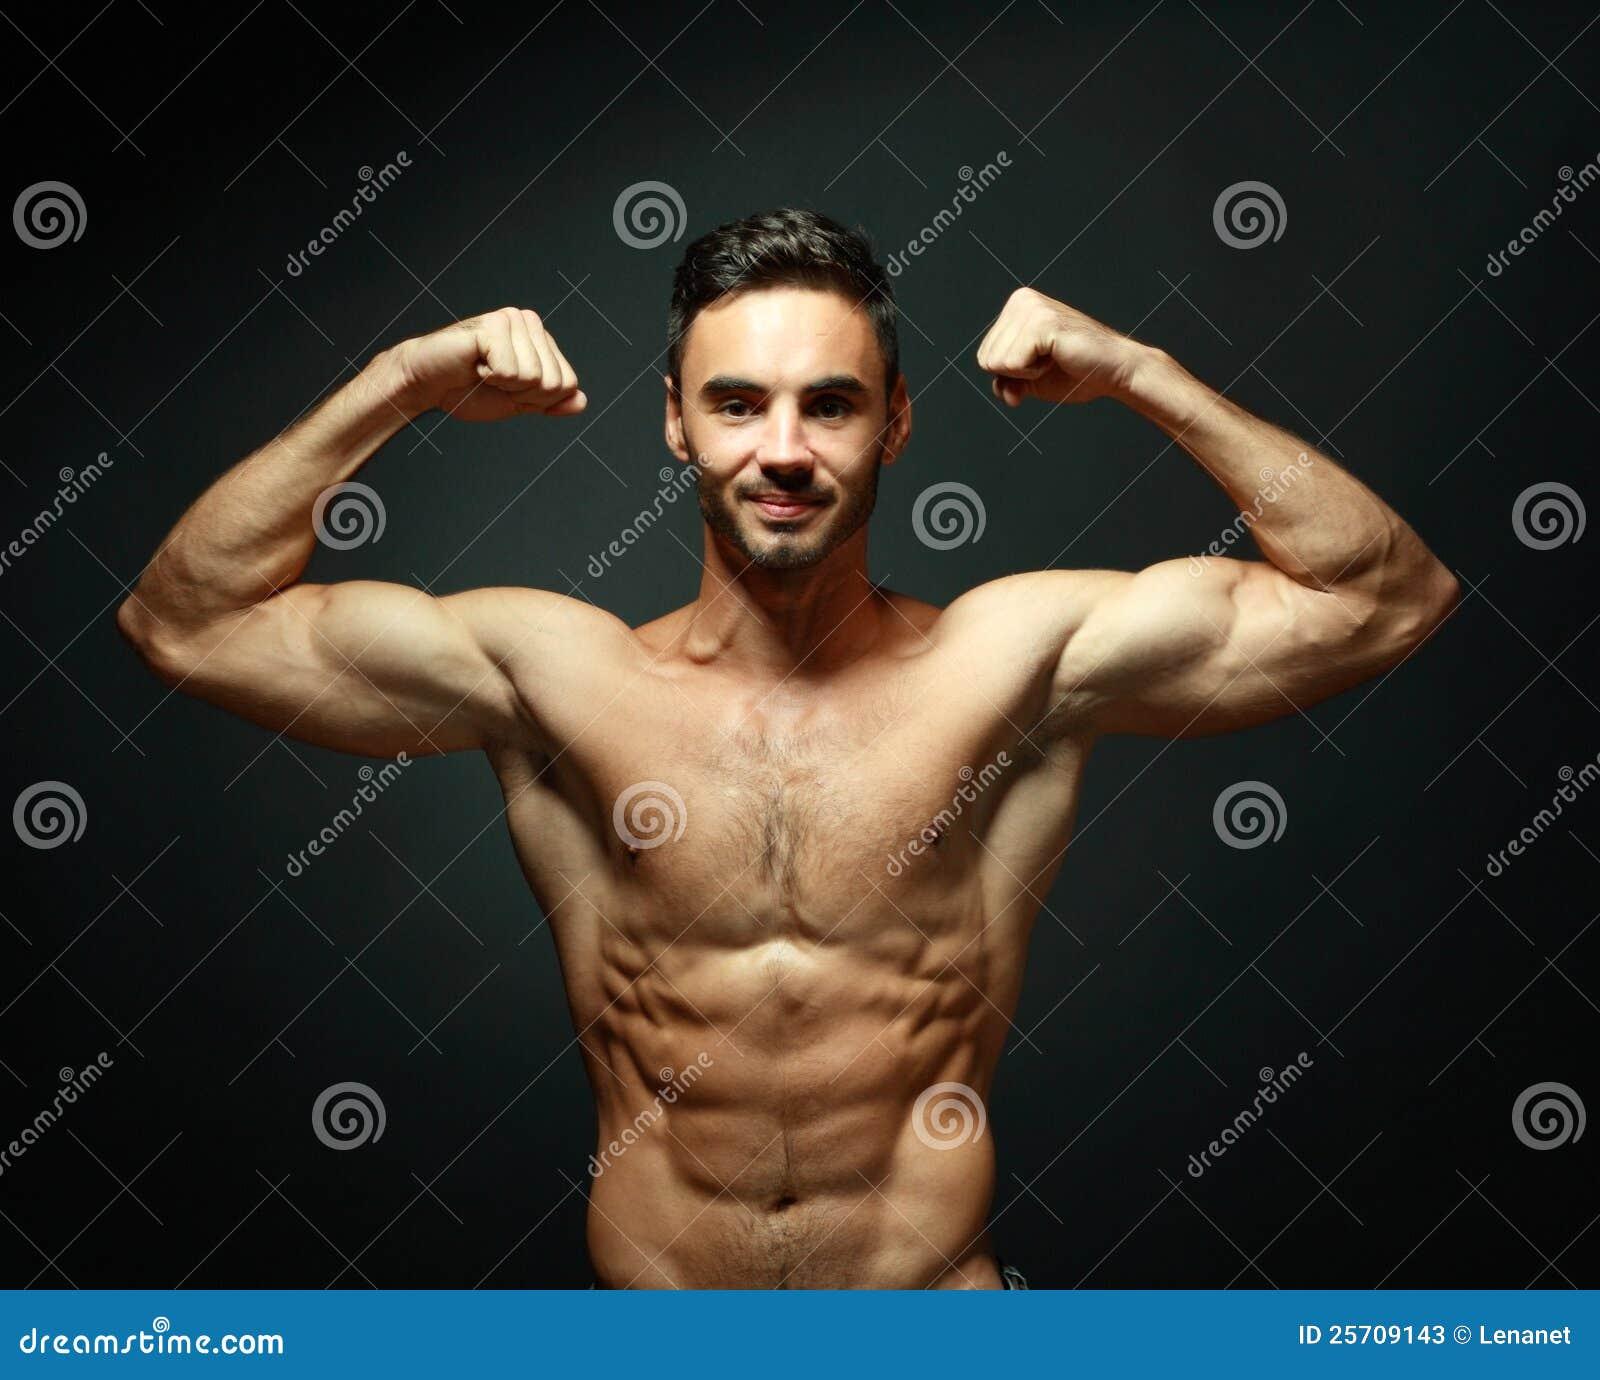 macho athletic